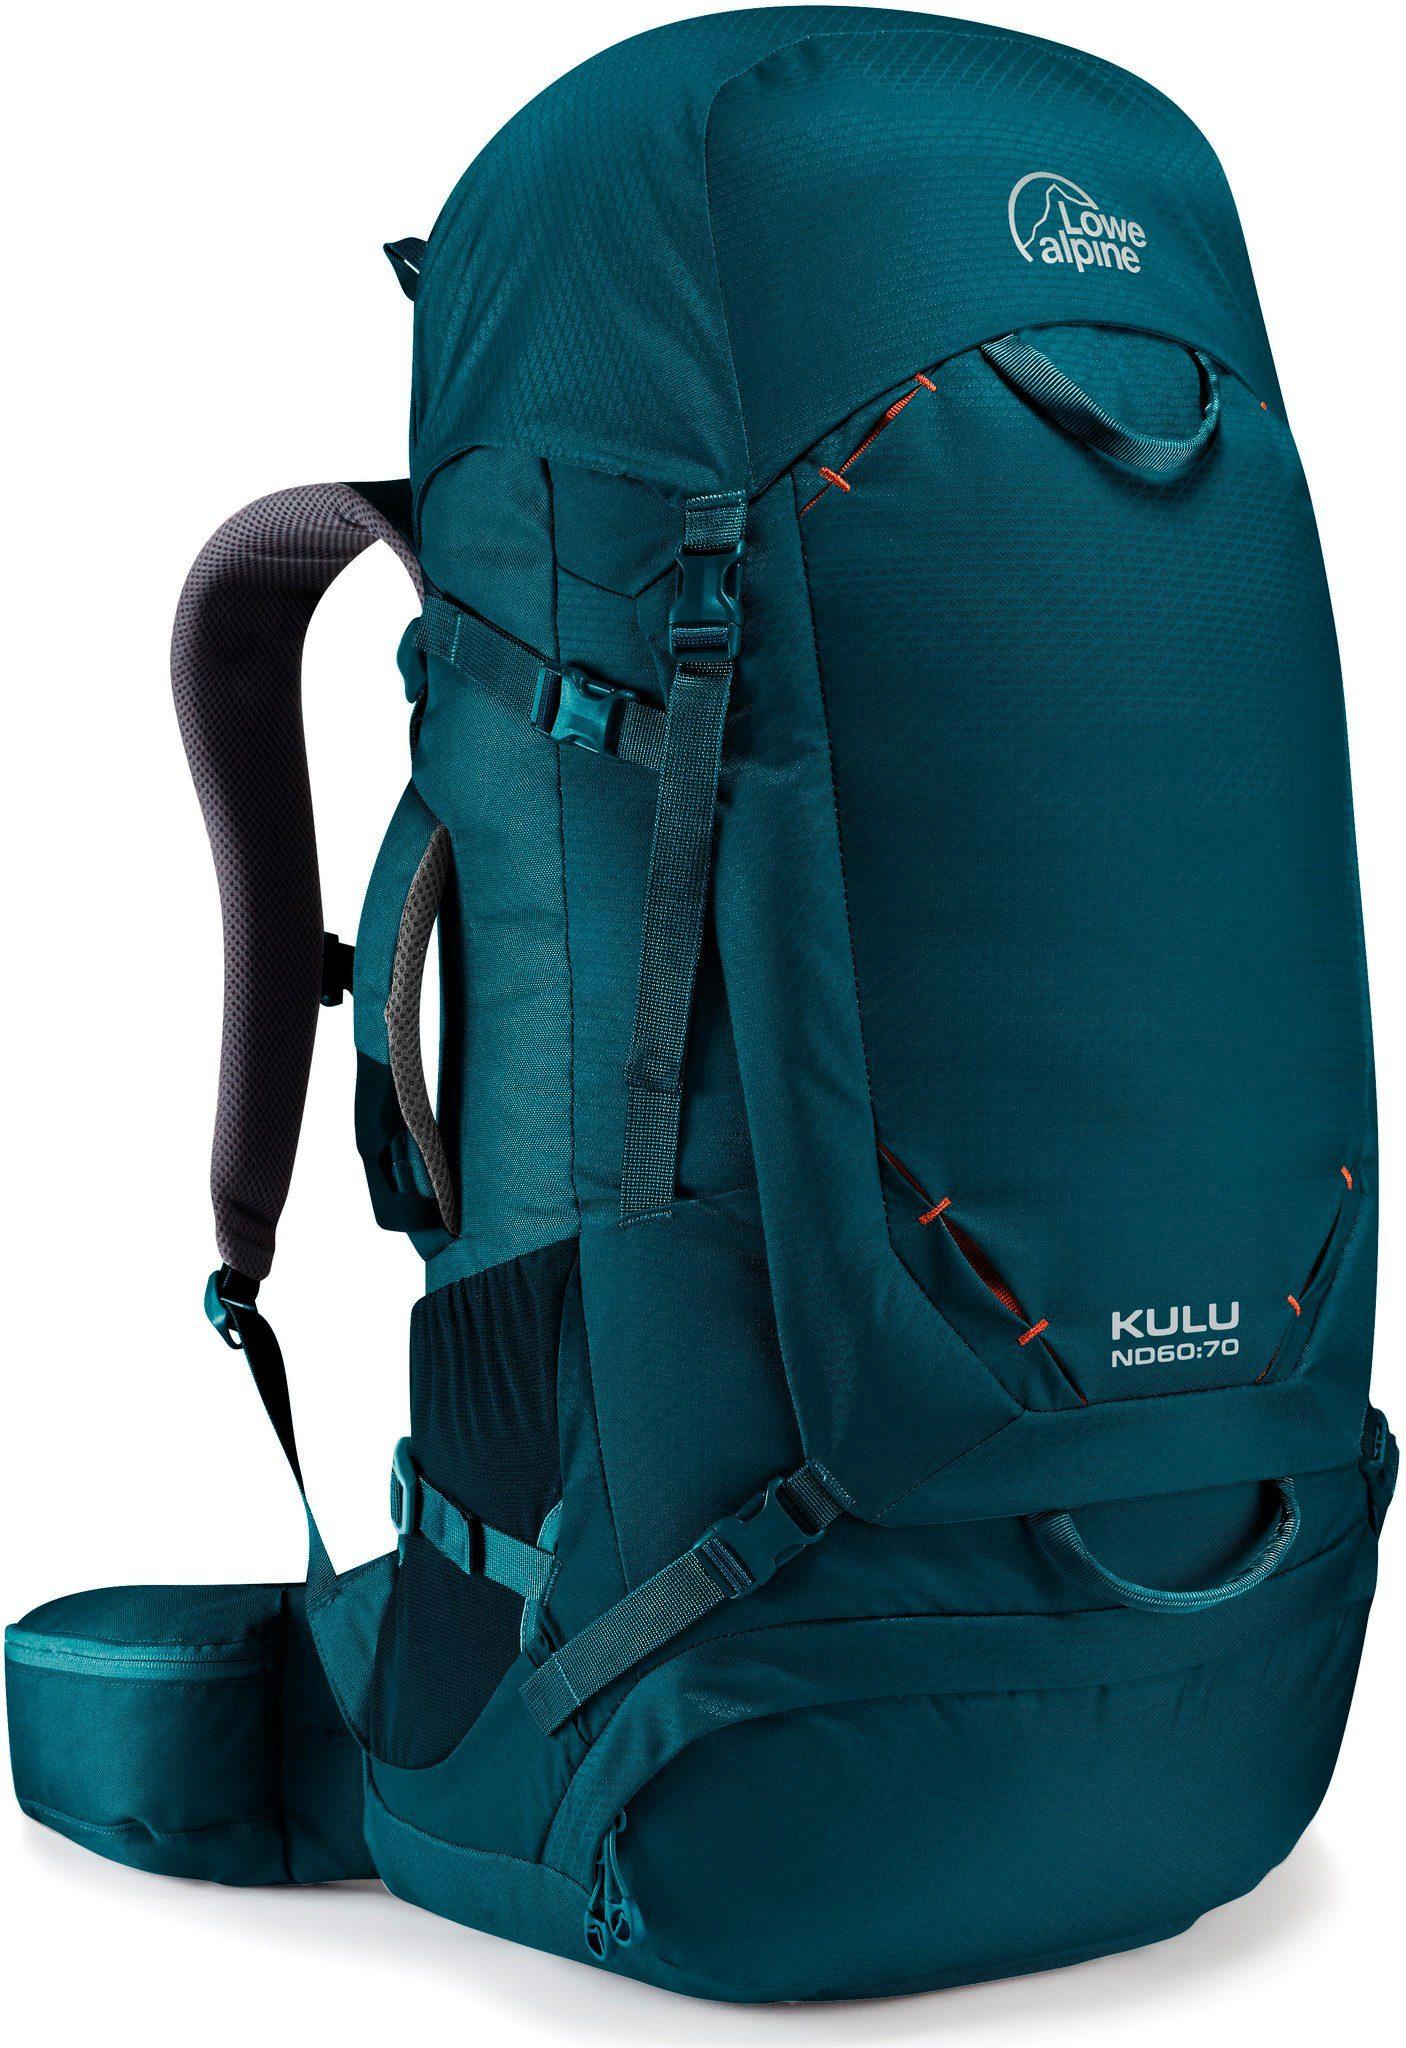 Lowe Alpine Wanderrucksack »Kulu 60:70 Backpack Women«